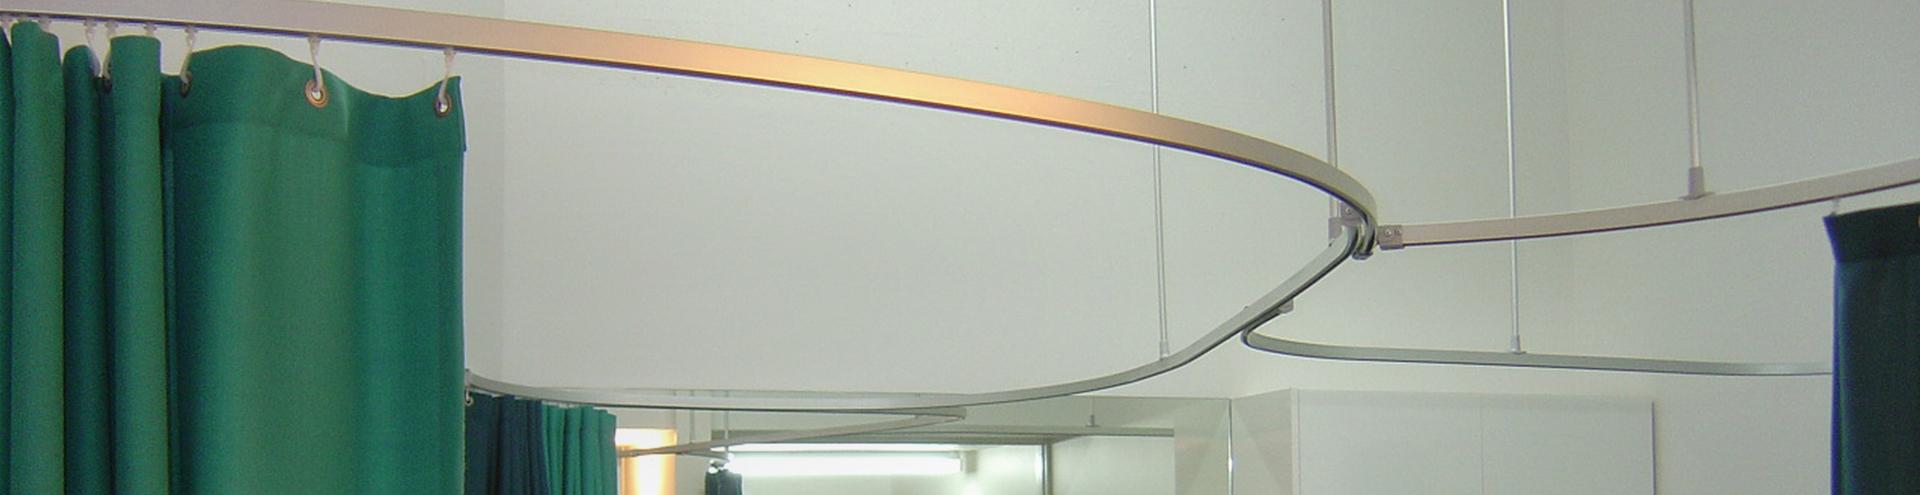 J Amp J Aluminium Christchurch Curtain Tracks Amp Rods